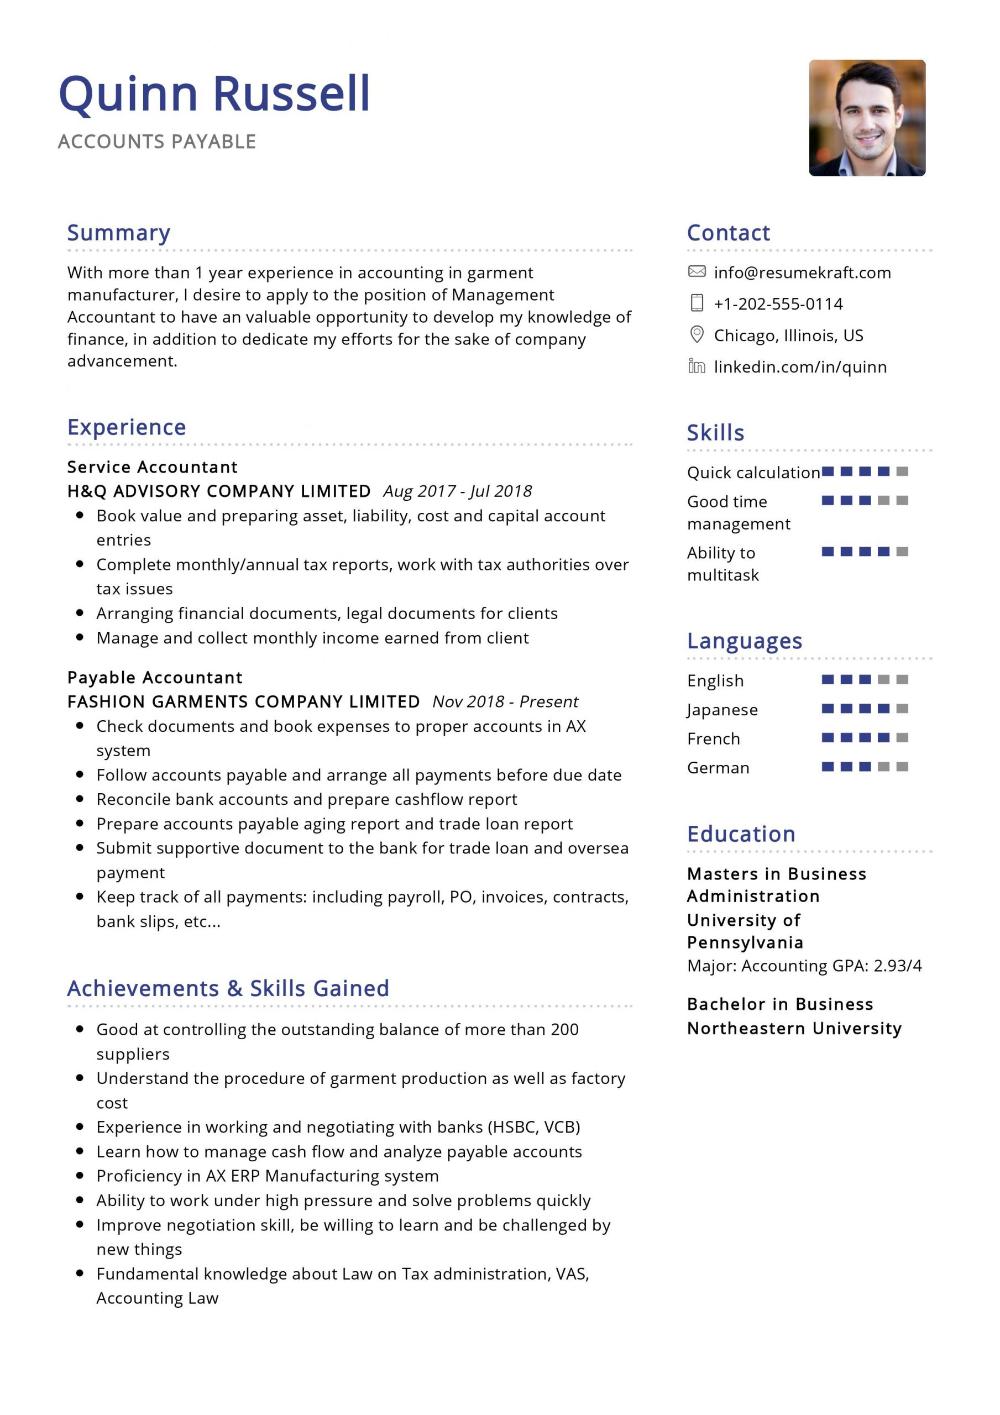 100 Professional Resume Samples For 2020 Resumekraft Accounts Payable Resume Sample Resume